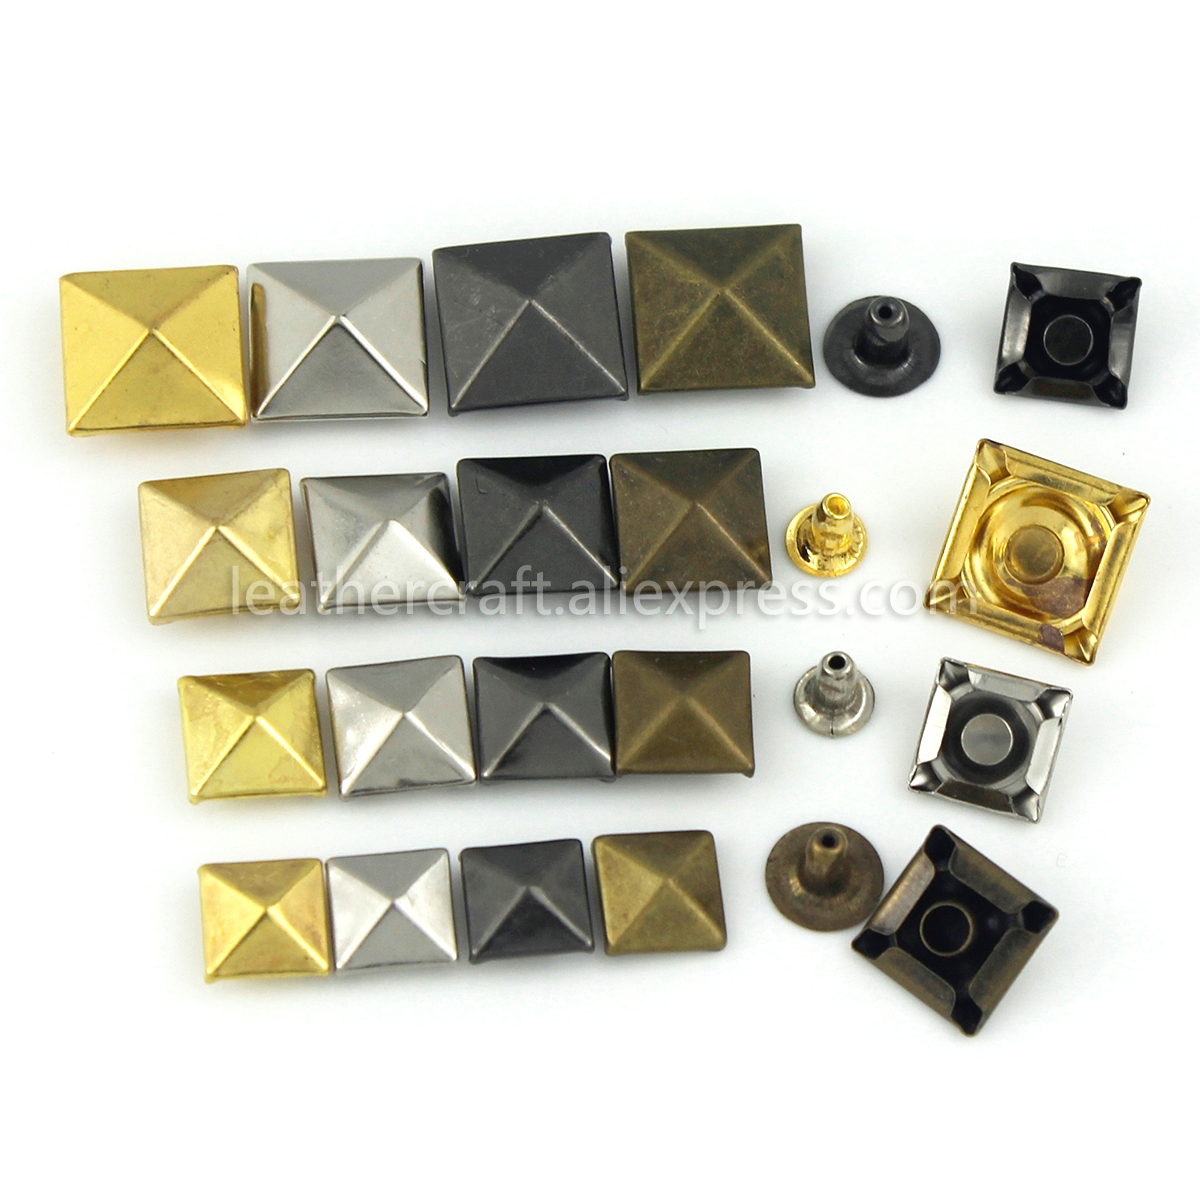 100sets Metal Pyramid Cap Rivets Studs Square Rivet for Leather Craft Bag Belt Clothing Garment Shoes Pet Collar Decor